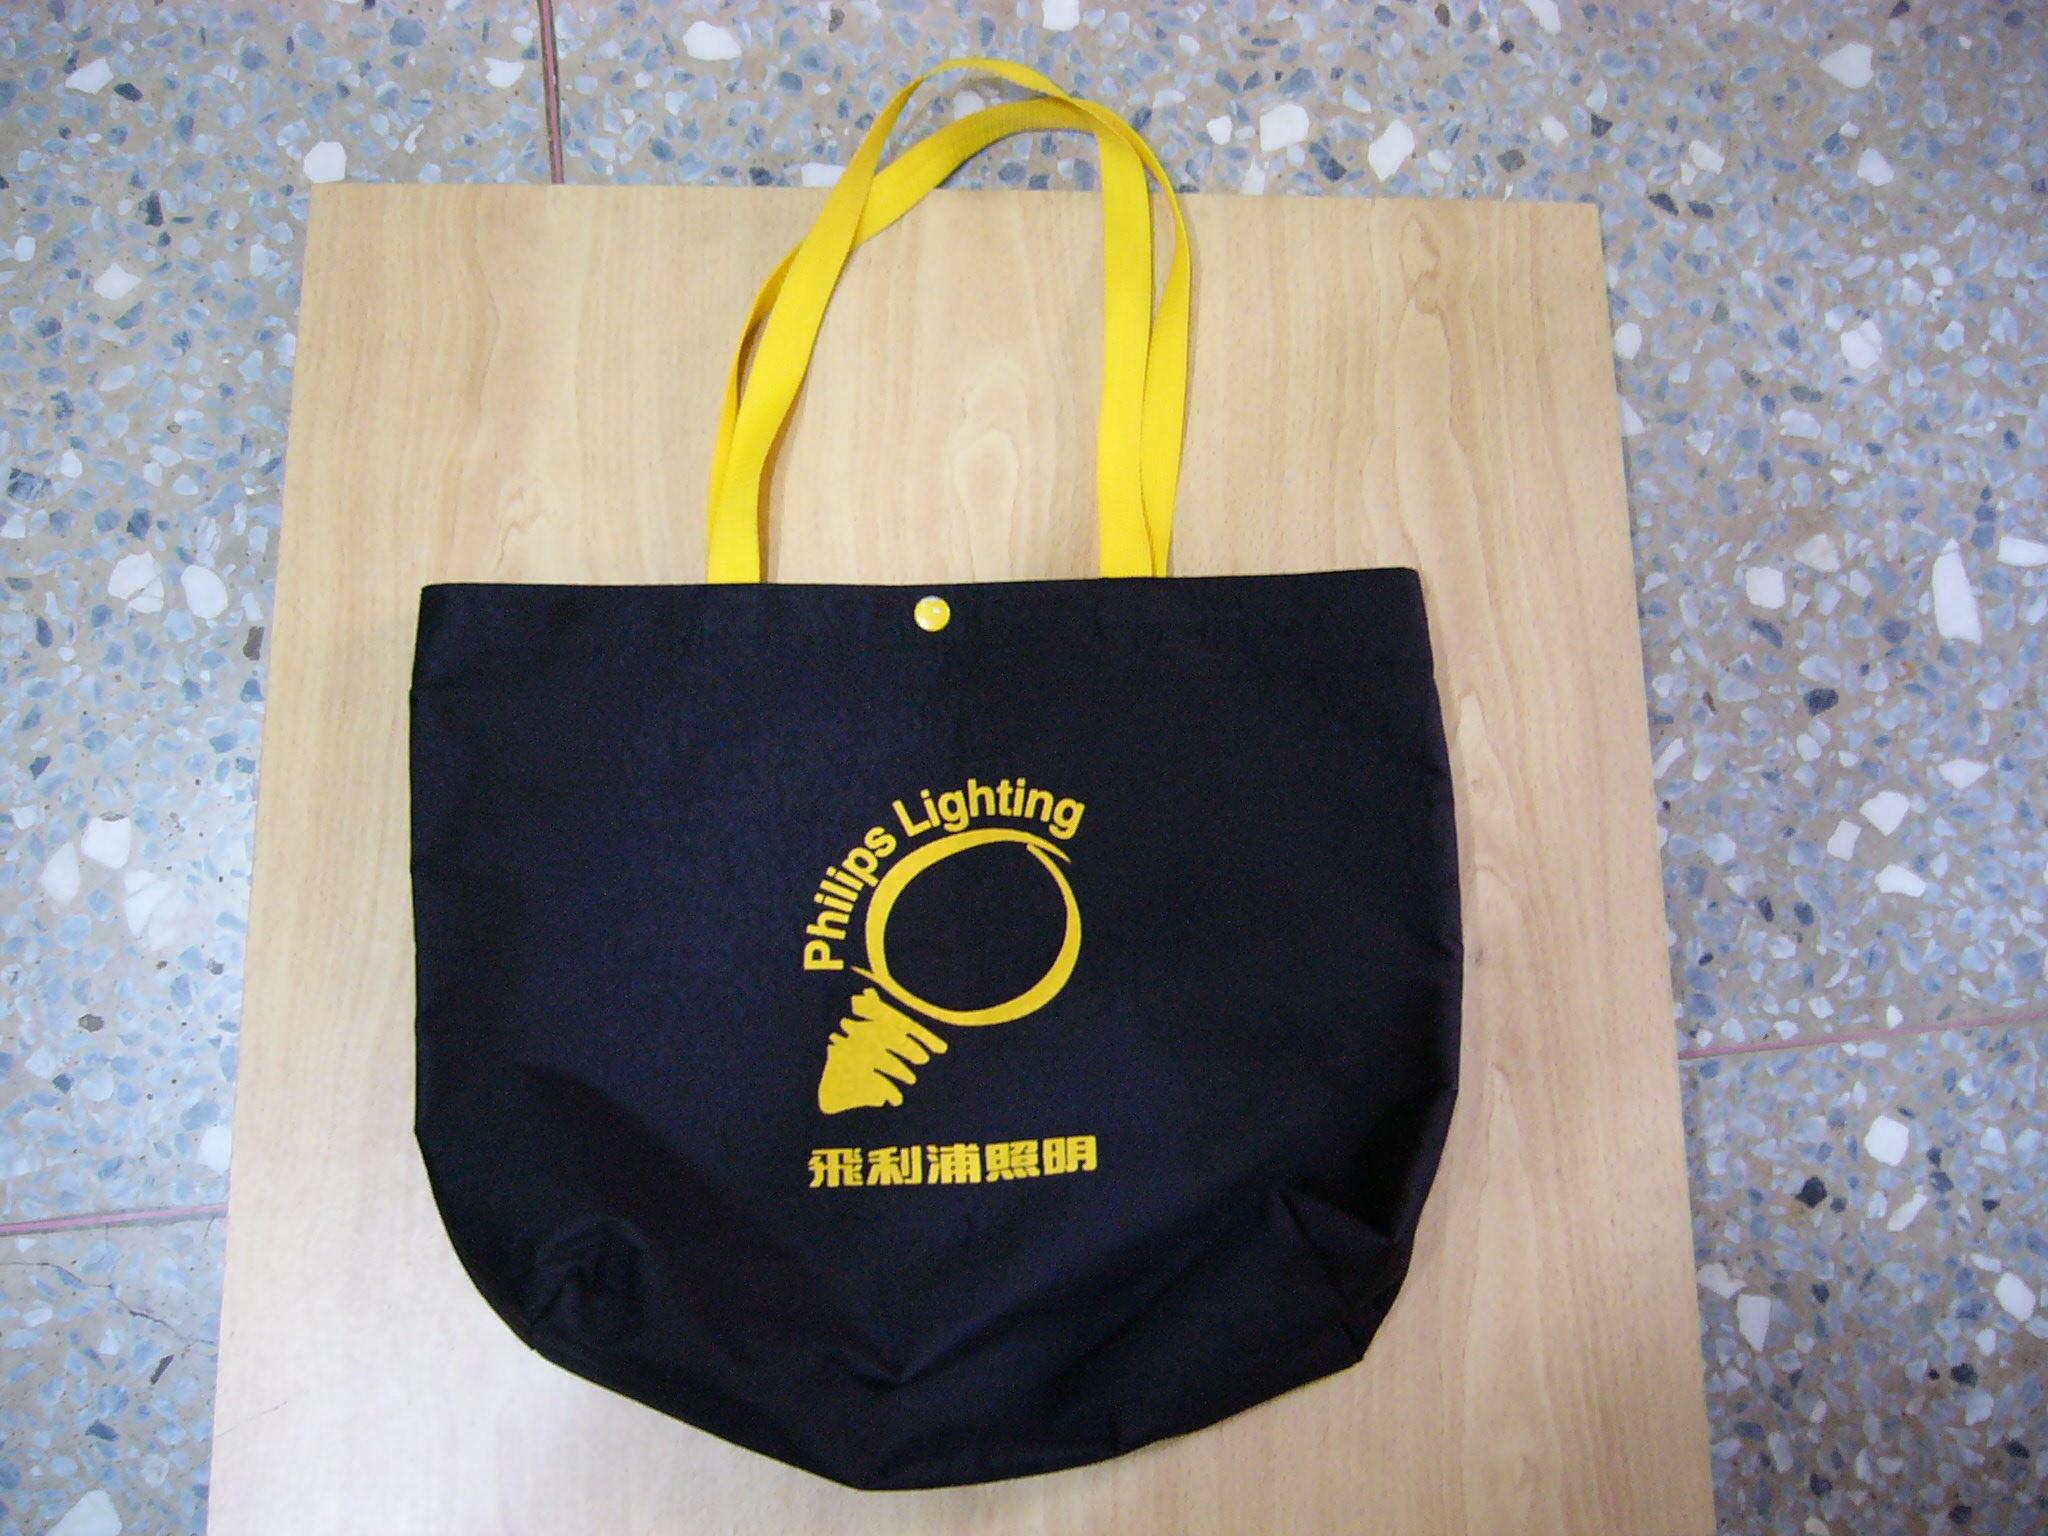 FilePhilips Lighting reusable shopping bag in Taiwan.jpg & File:Philips Lighting reusable shopping bag in Taiwan.jpg ... azcodes.com